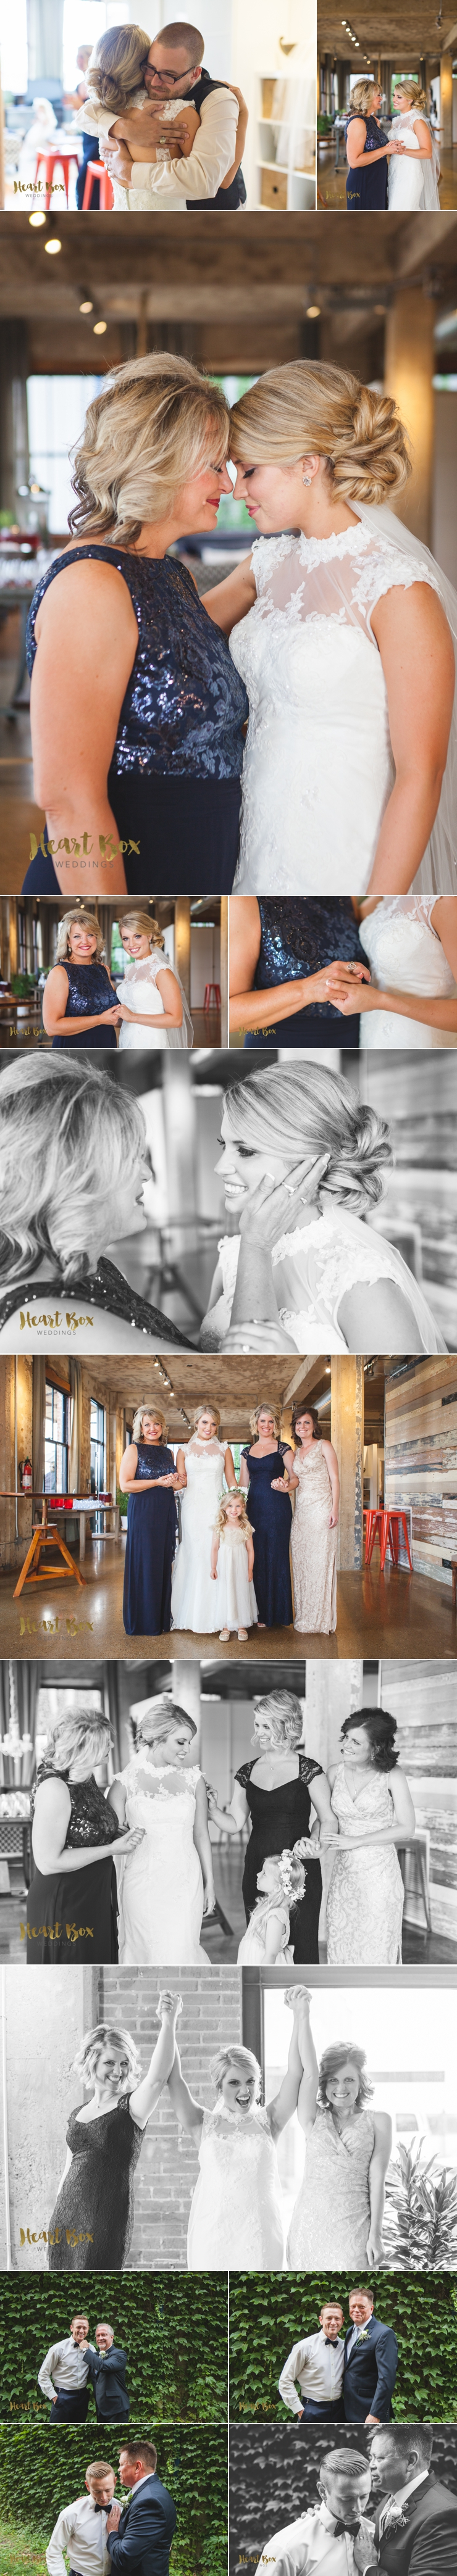 Mabry Wedding 10.jpg